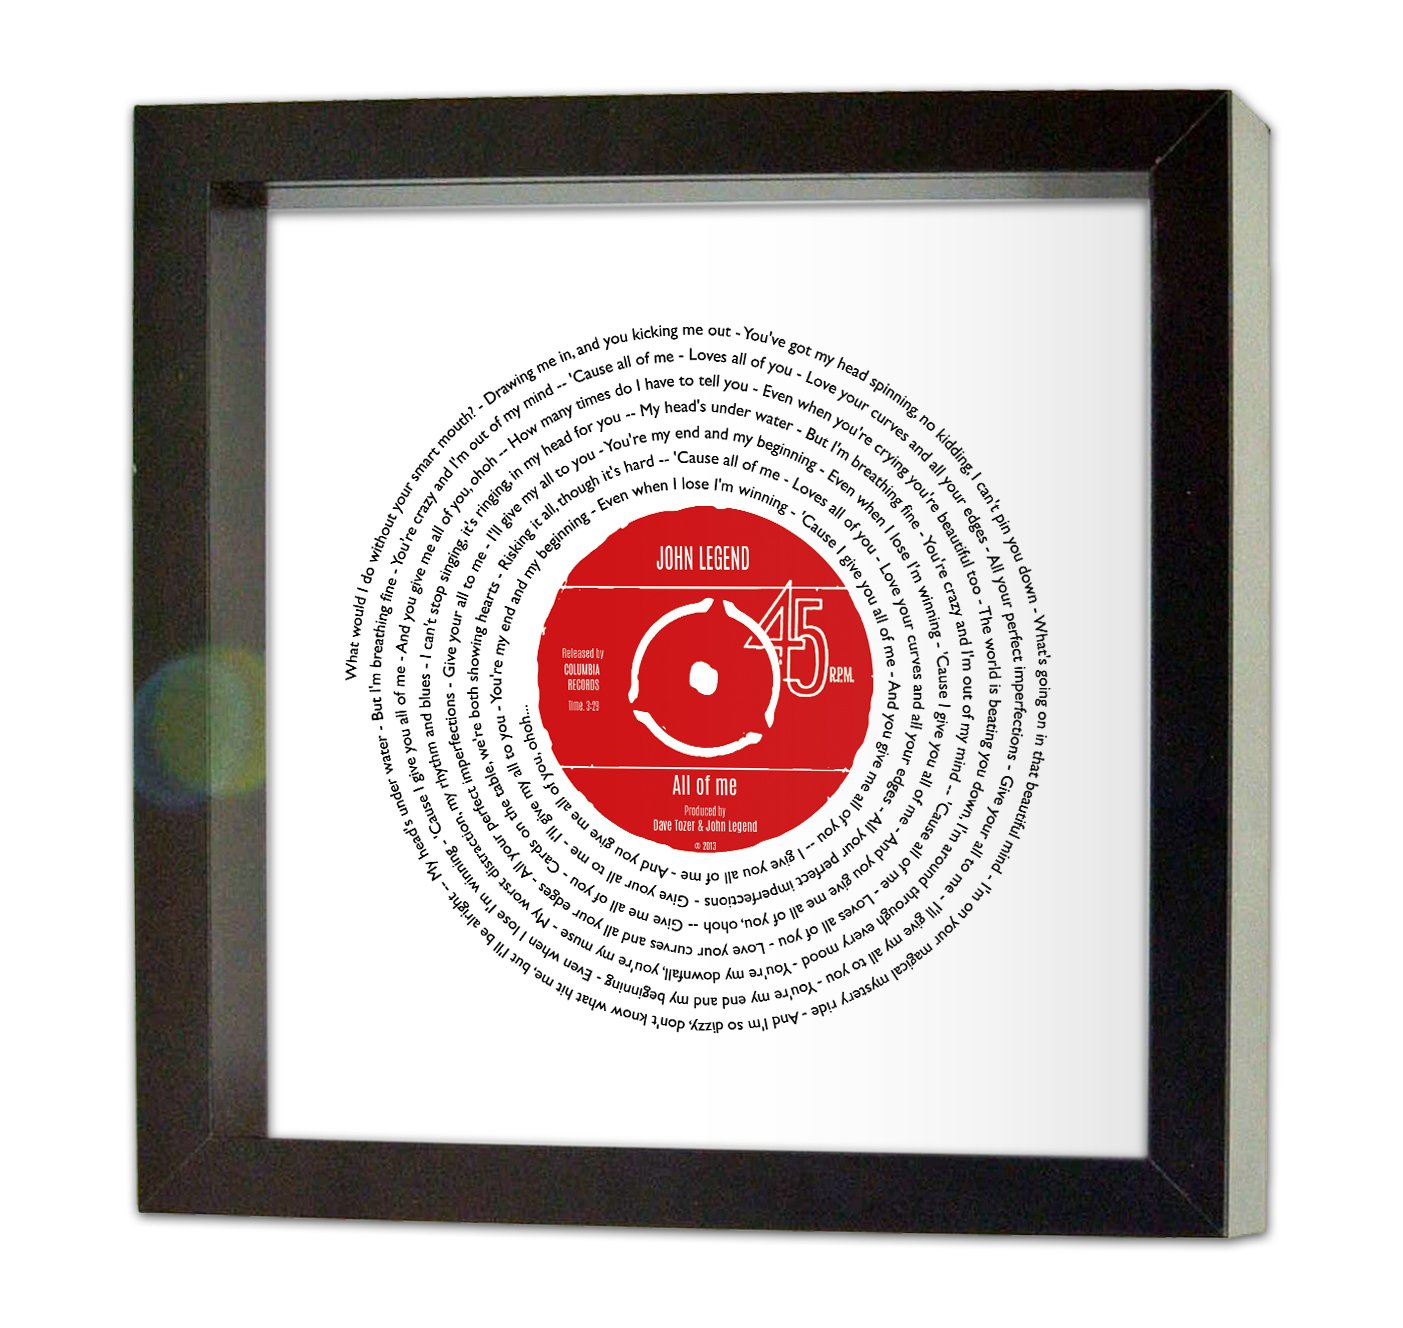 Amazon.de: John Legend, All of me | PERSONALISED SONG | Vinyl Record ...